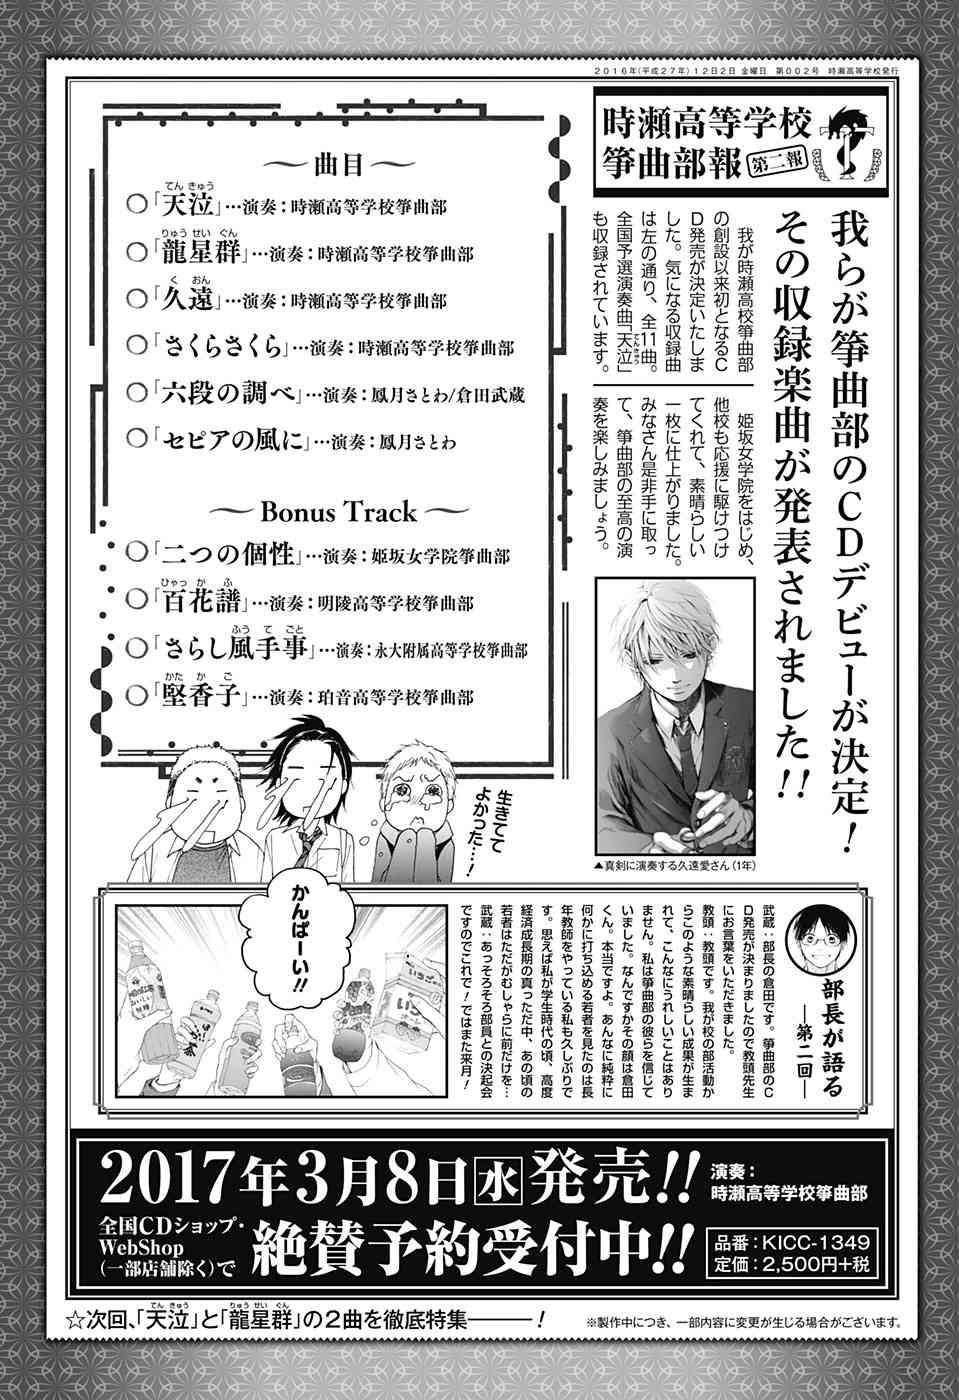 Kono-Oto-Tomare! Chapter 53 Page 1